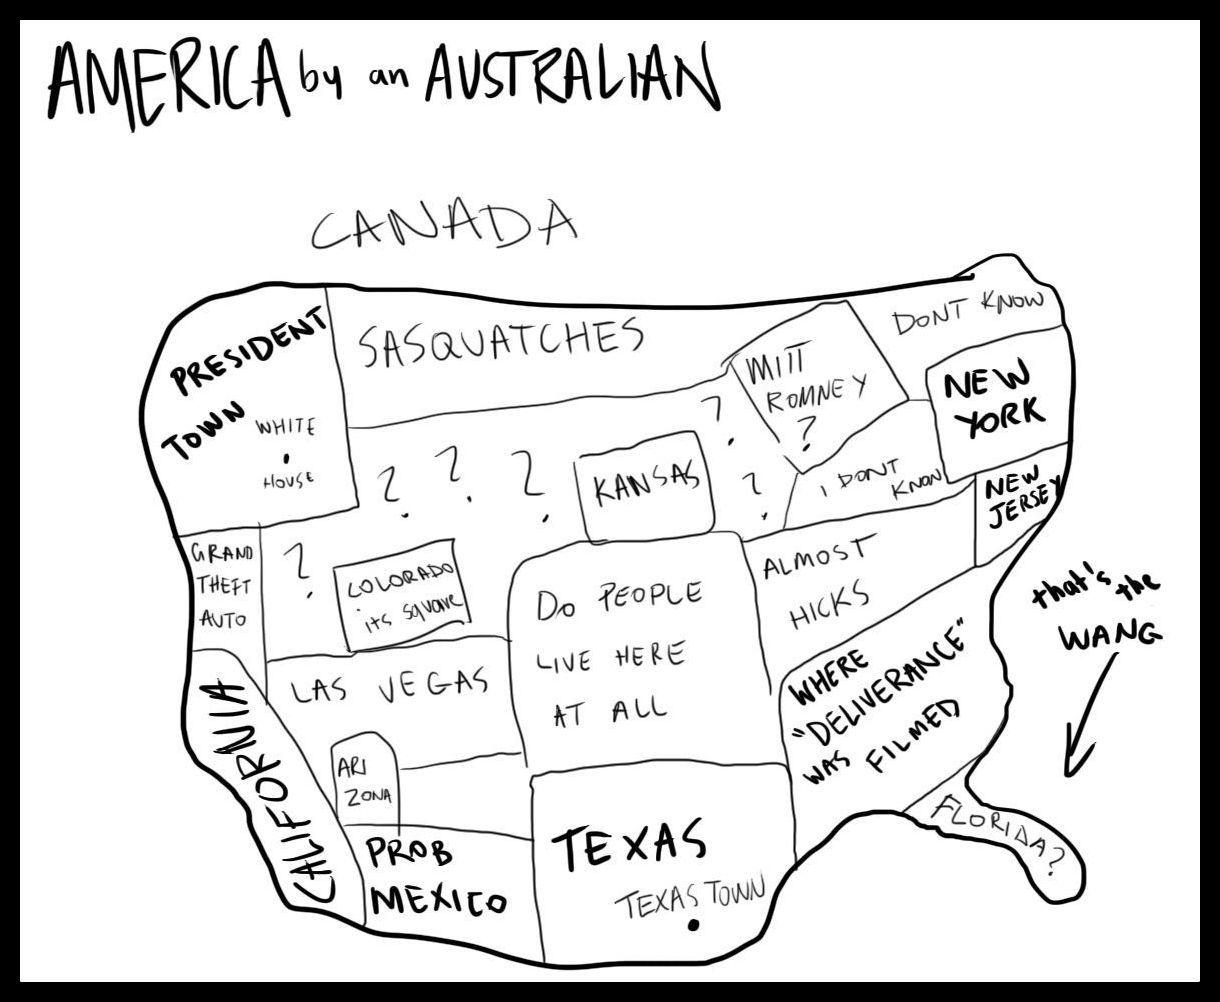 """AMERICA"" as drawn by an Australian!  (Tongue in cheek)"